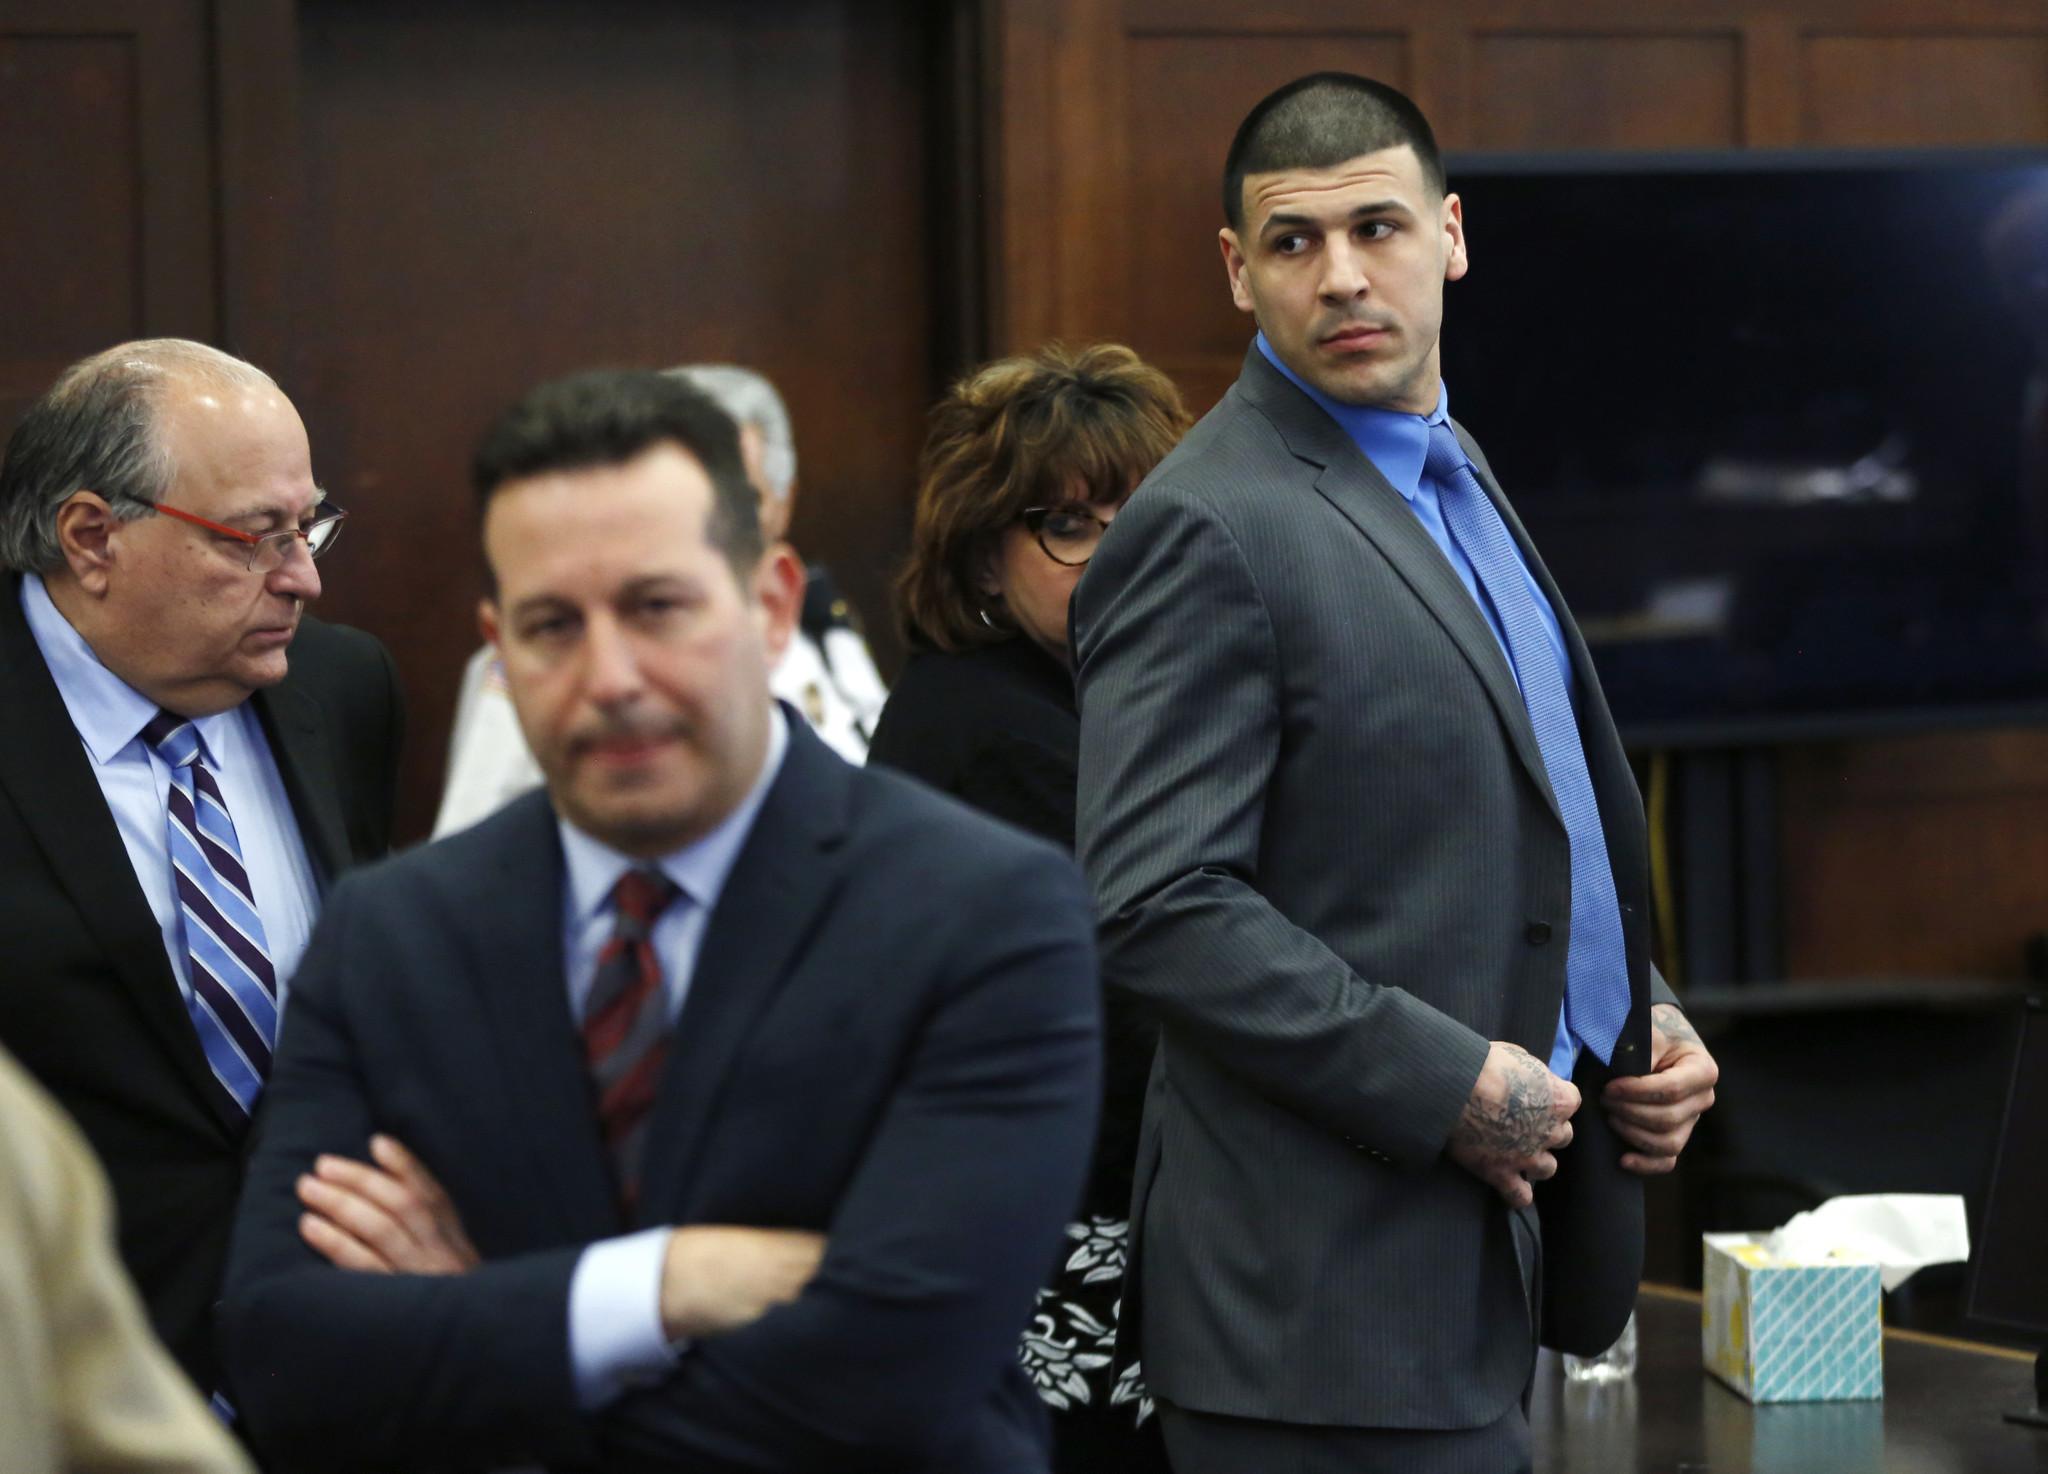 ex patriots star aaron hernandez acquitted in double murder ex patriots star aaron hernandez acquitted in double murder chicago tribune